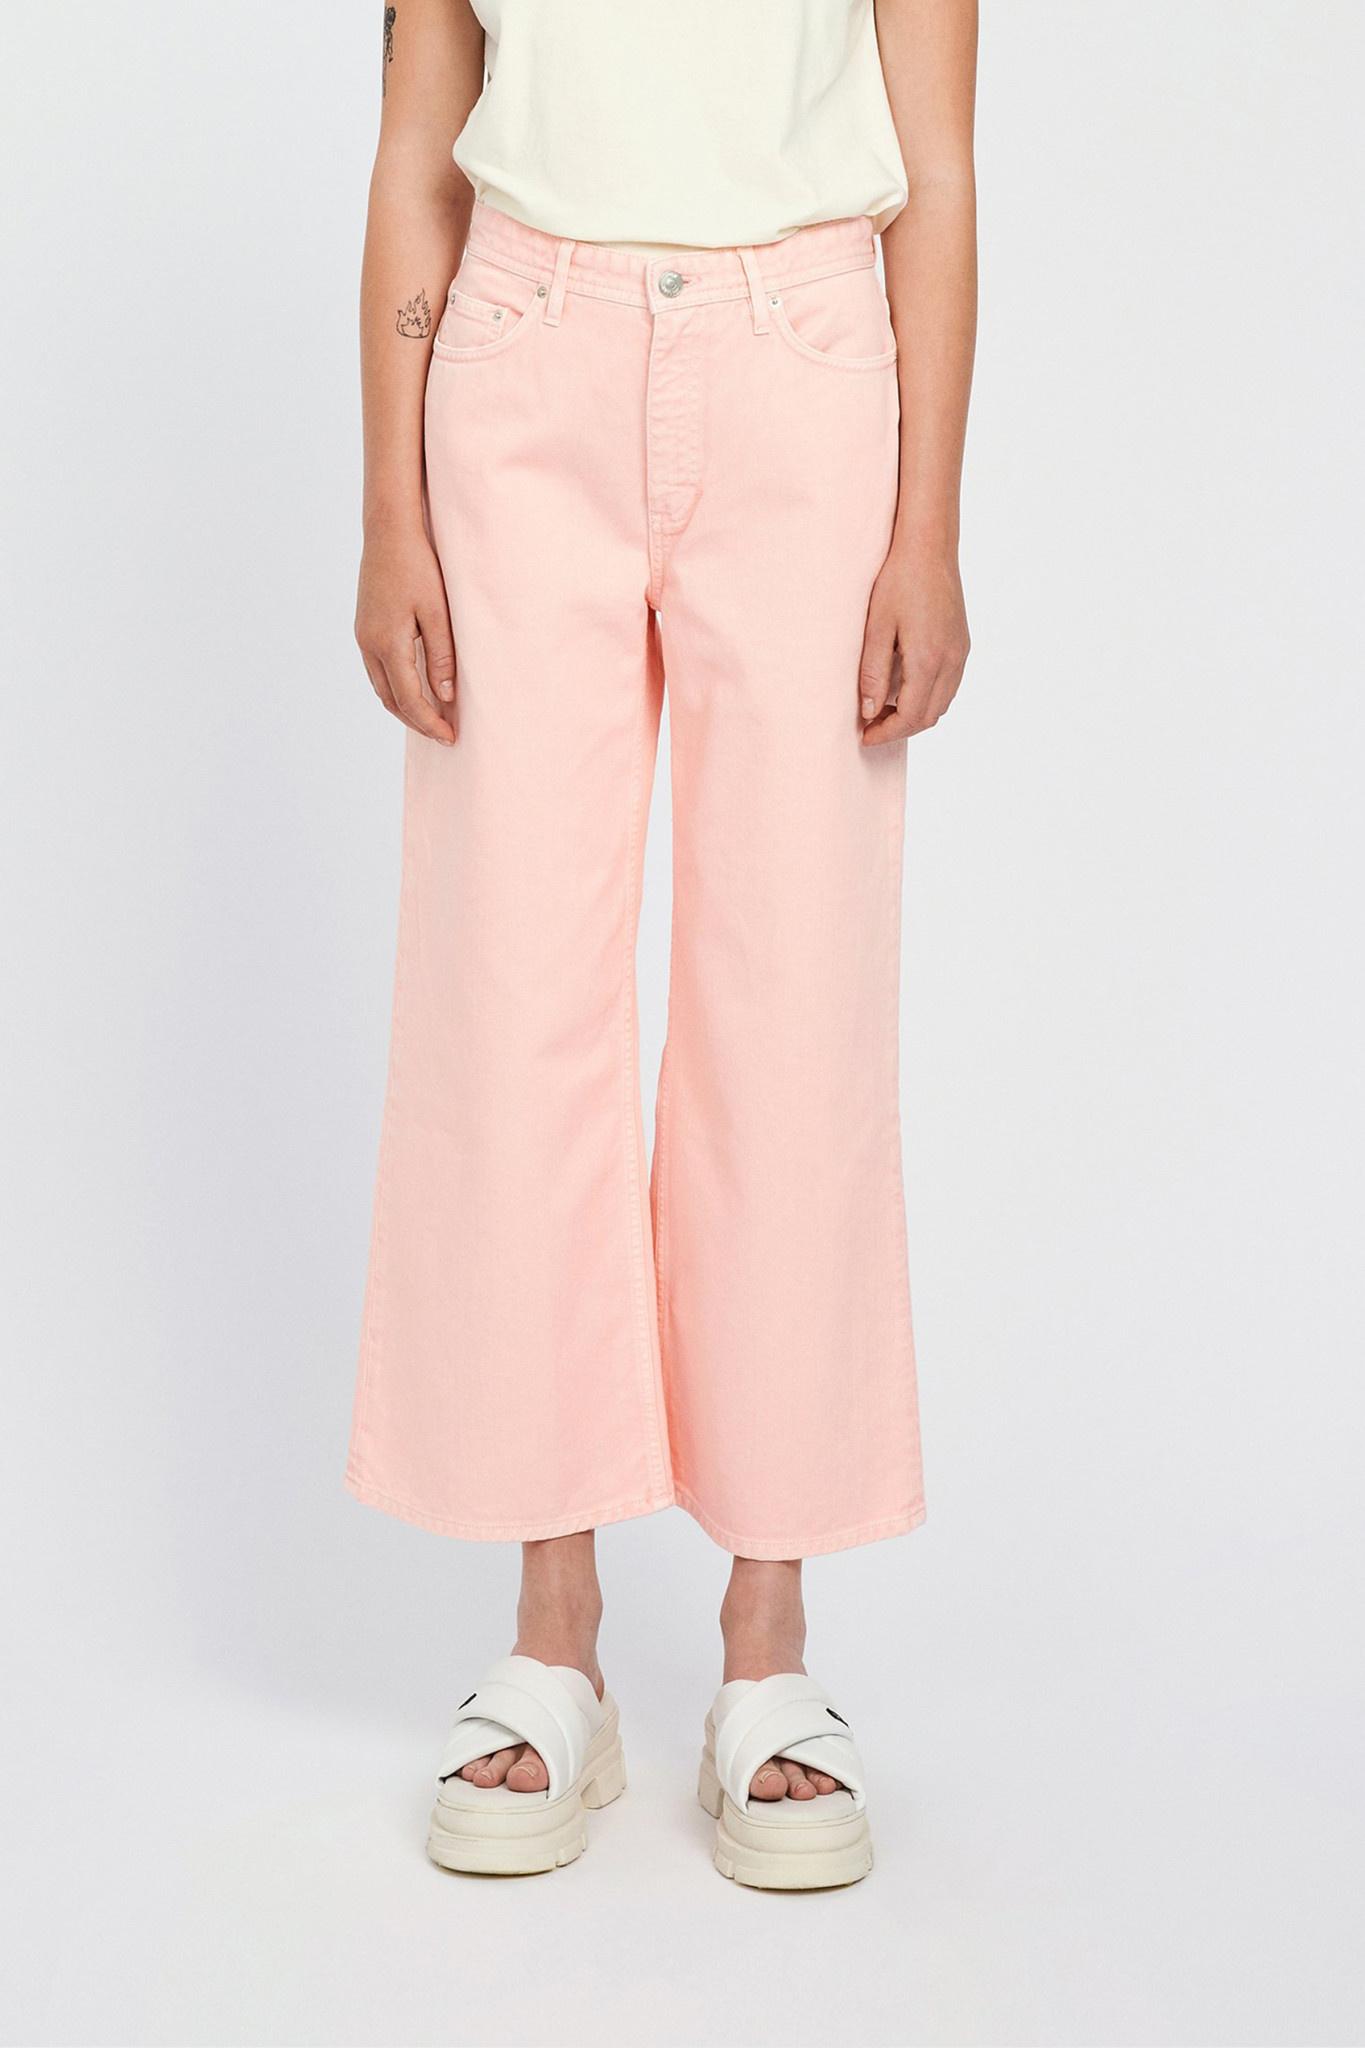 Kiri Flair Jeans - English Rose-1